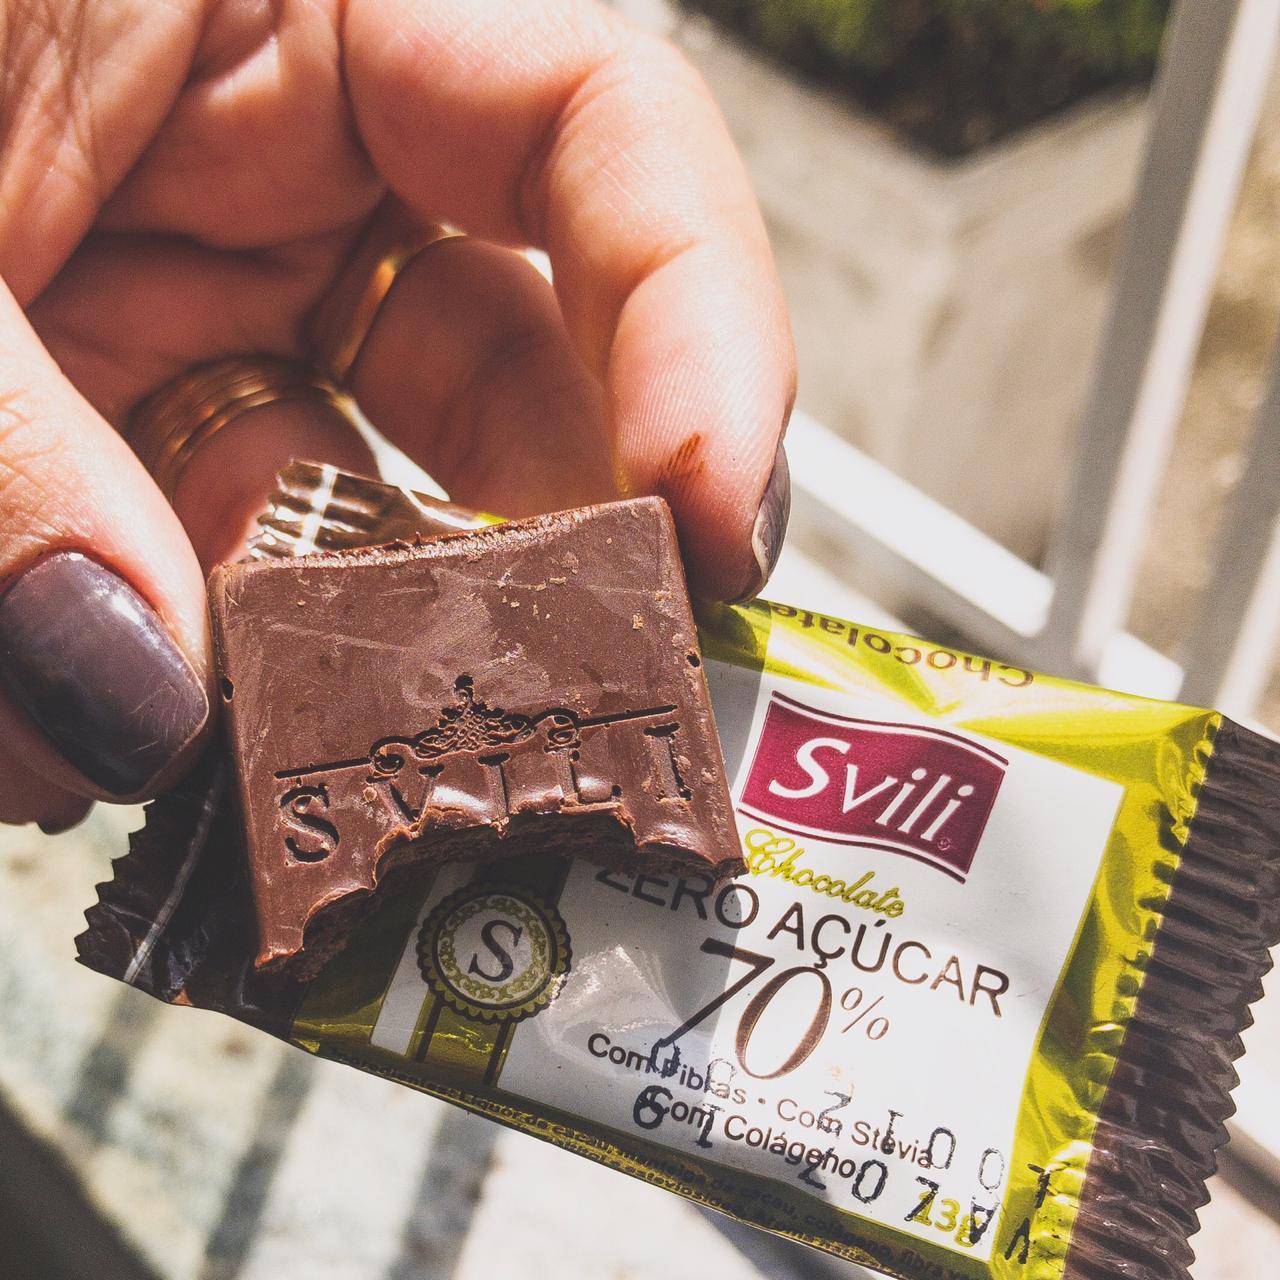 Chocolate 70% Zero Açúcar SVILI